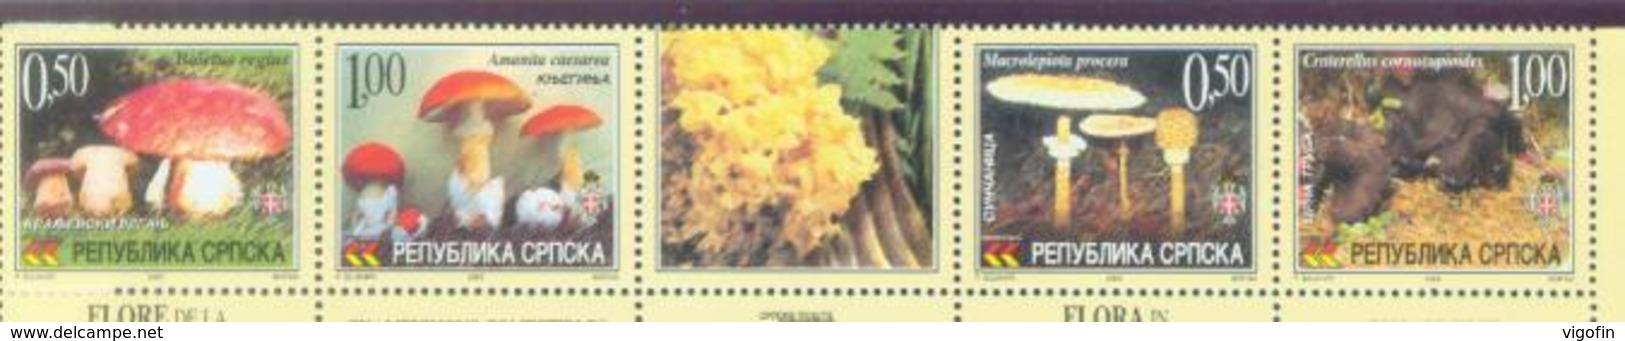 BHRS 2002-255-8 MUSHROOMS, BOSNA AND HERZEGOVINA REP. SRPSKA, 1 X 4v + LABEL, MNH - Pilze